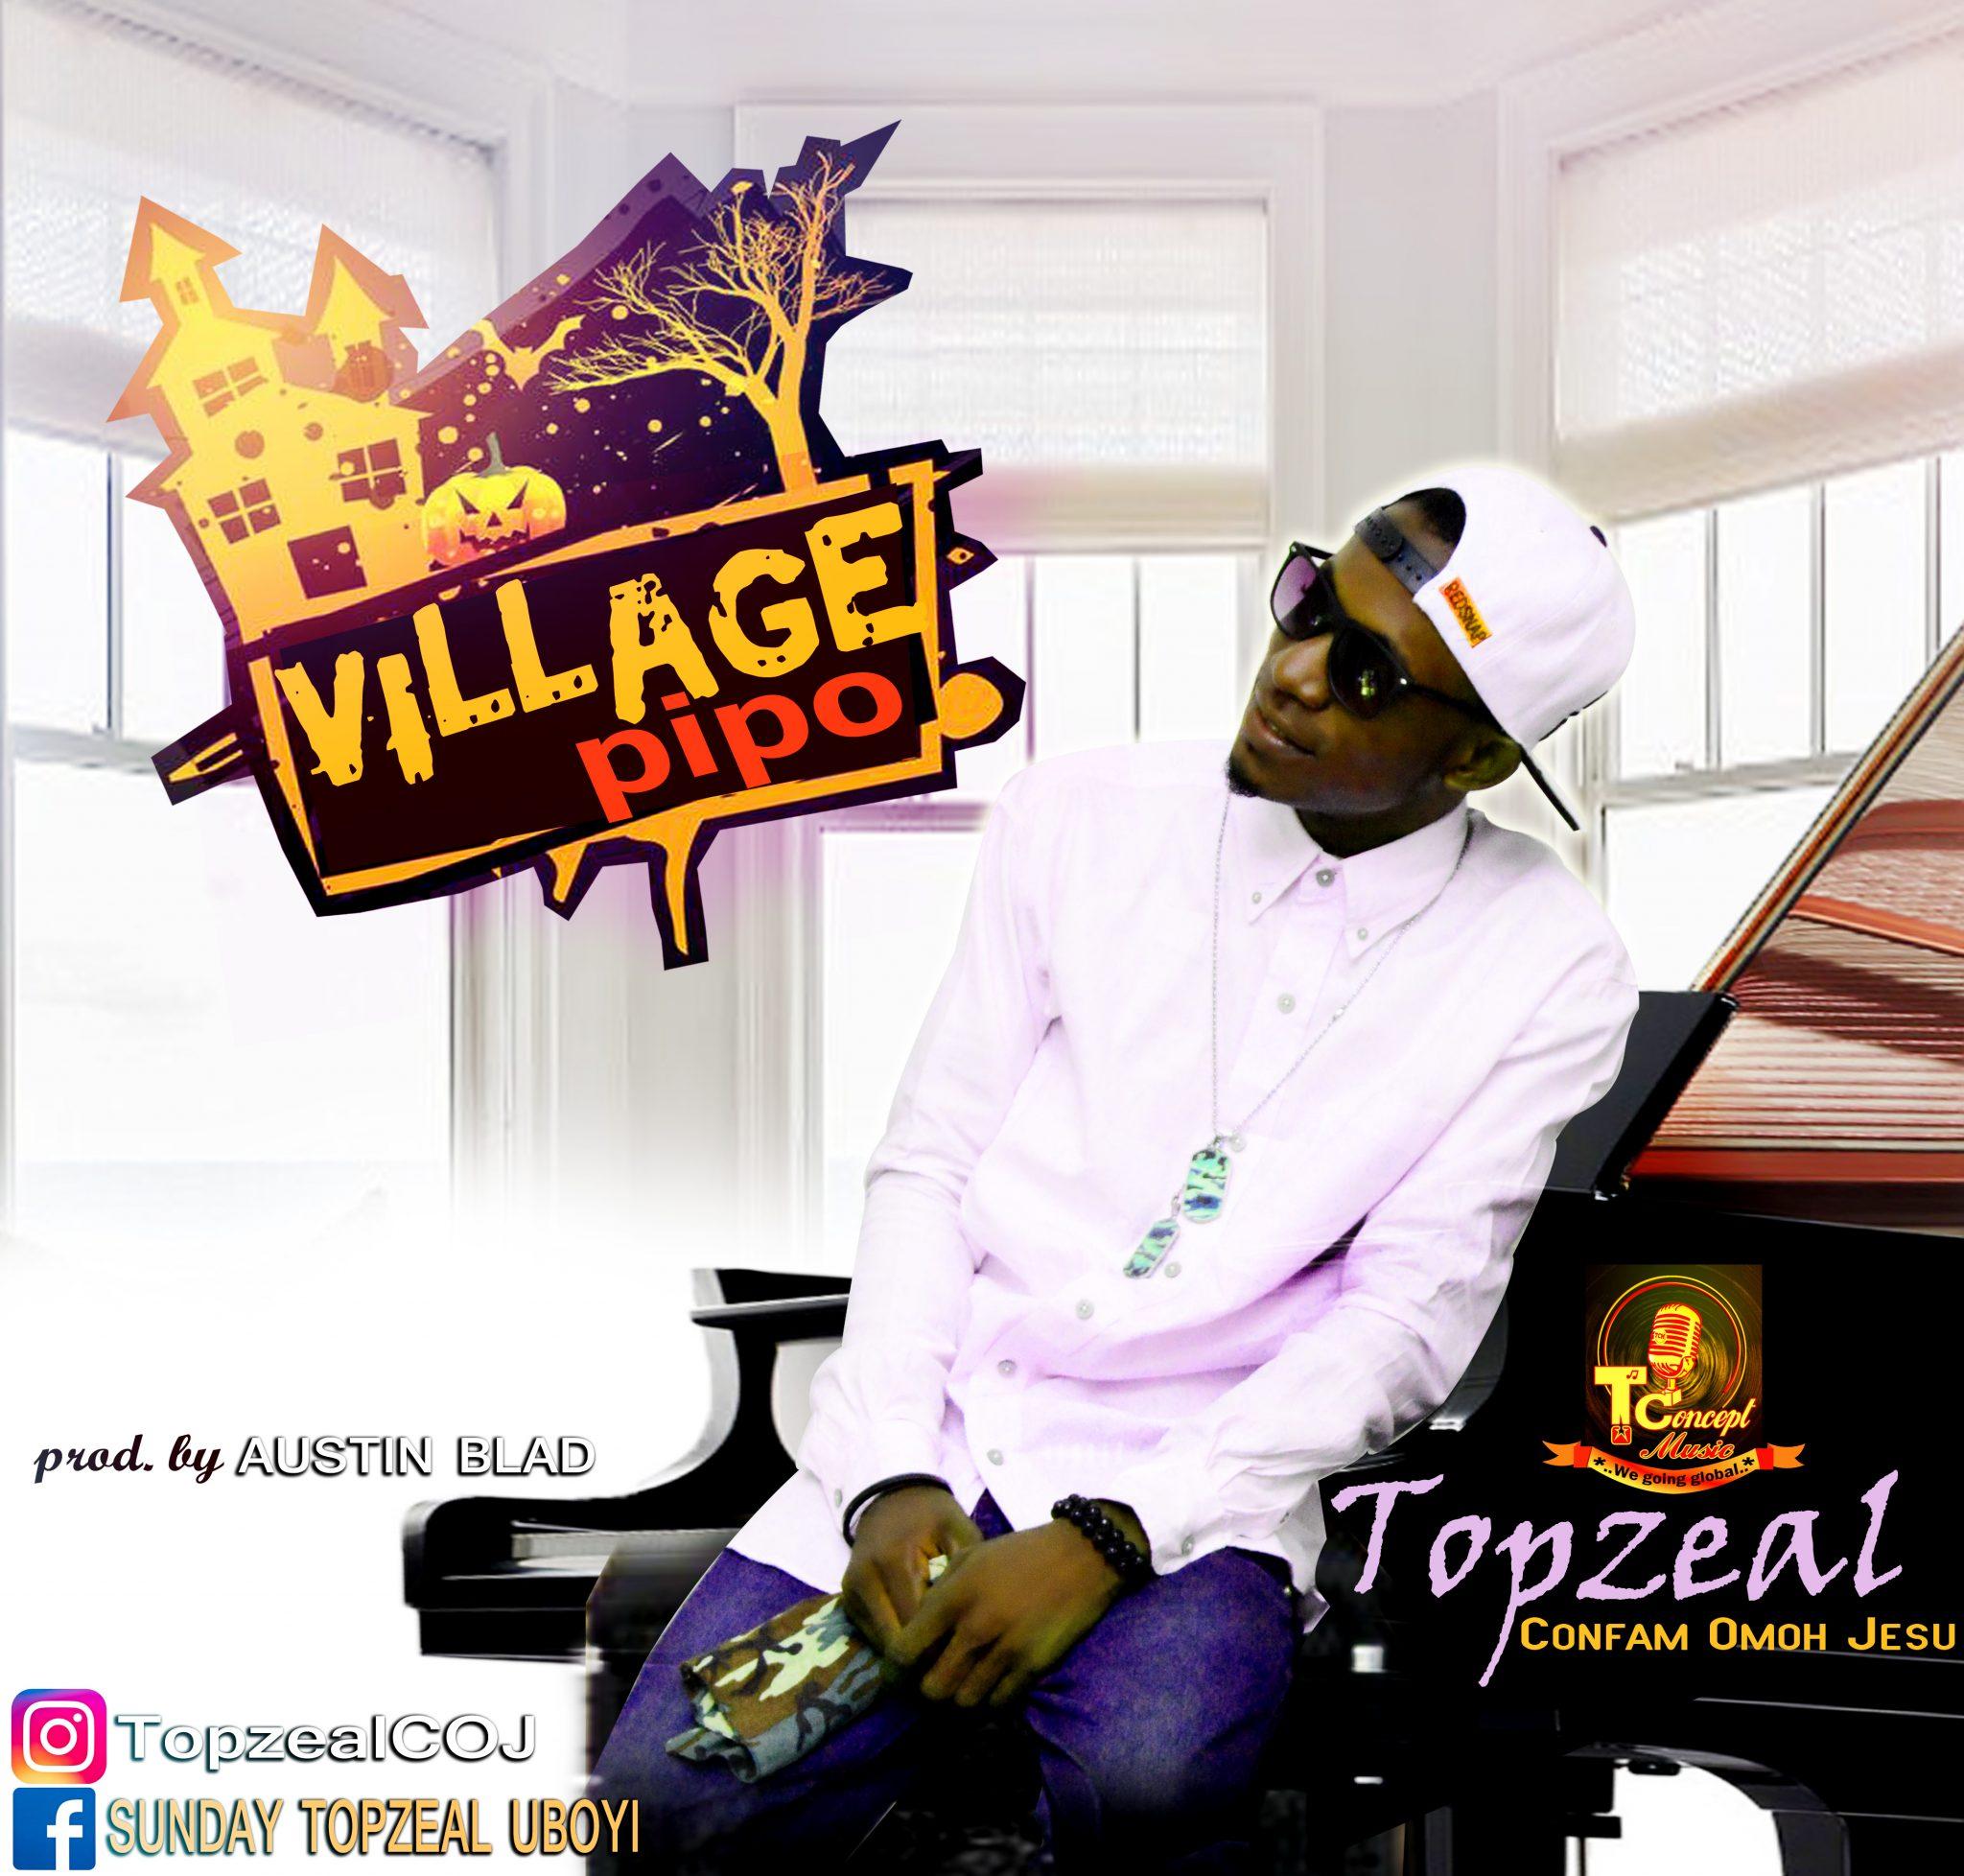 TOpzeal - VIllage Pipo